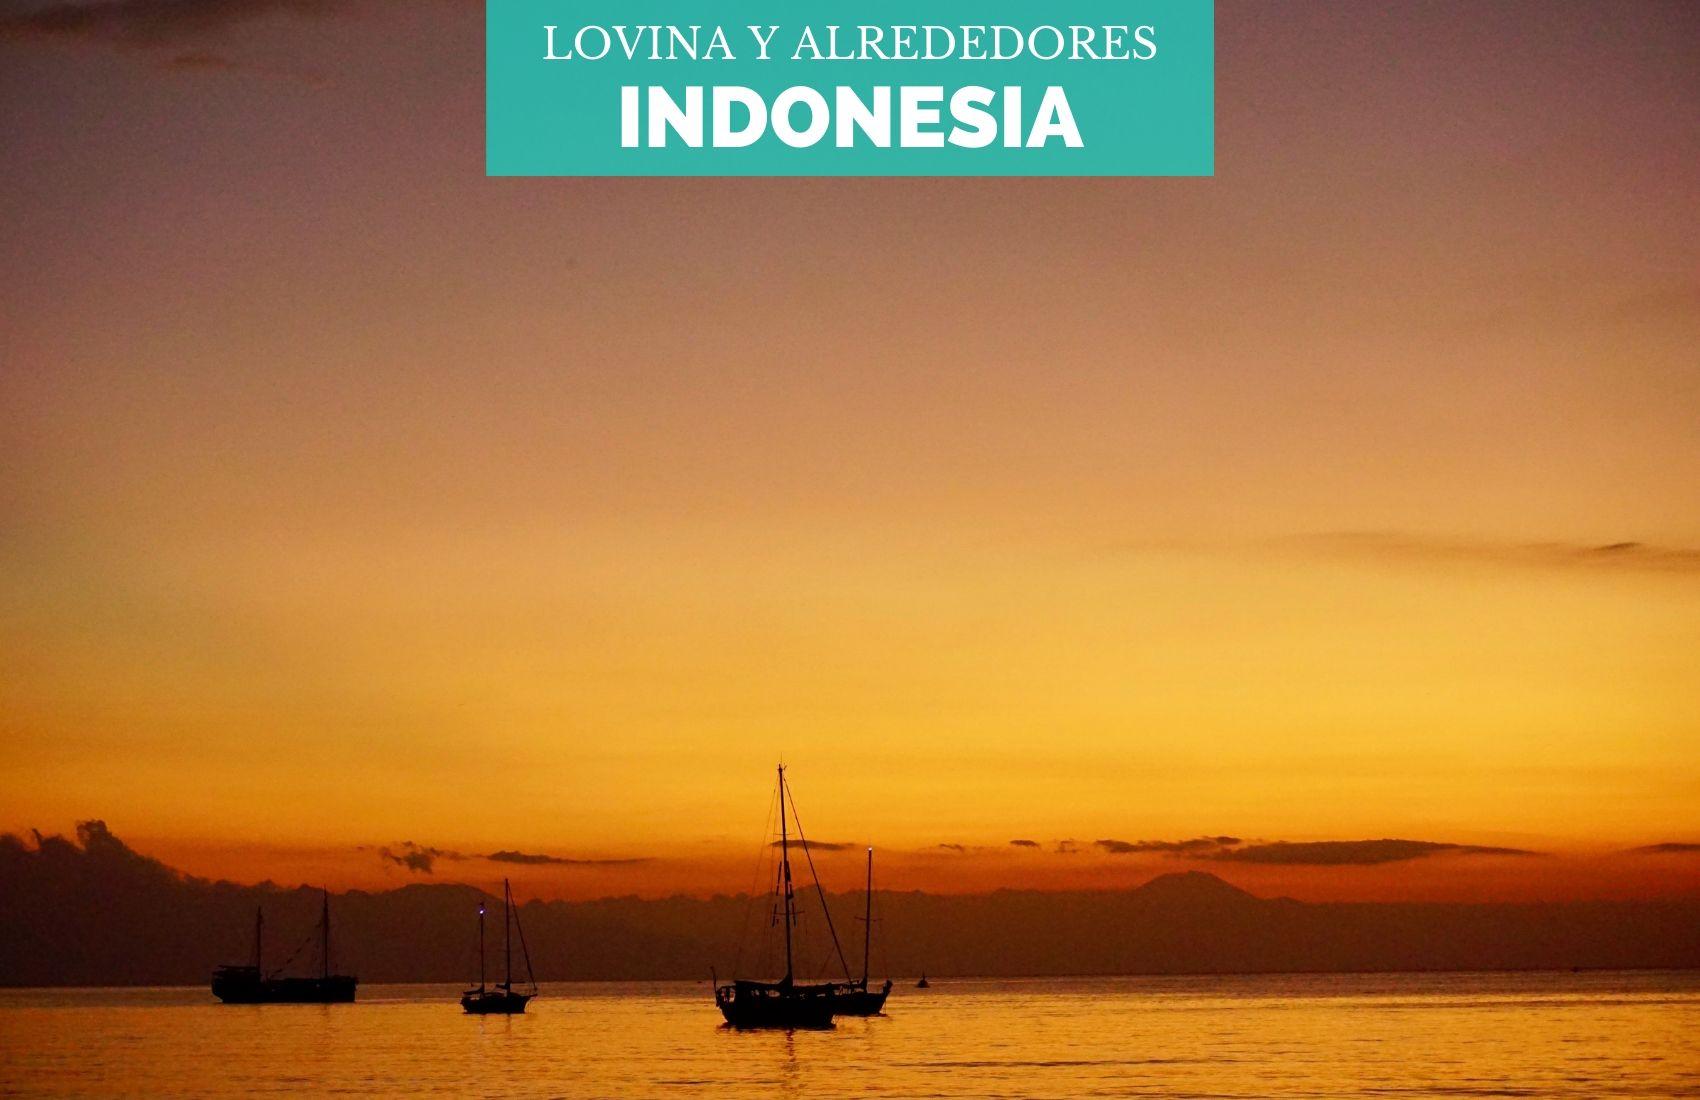 Portada-indonesia-lovina